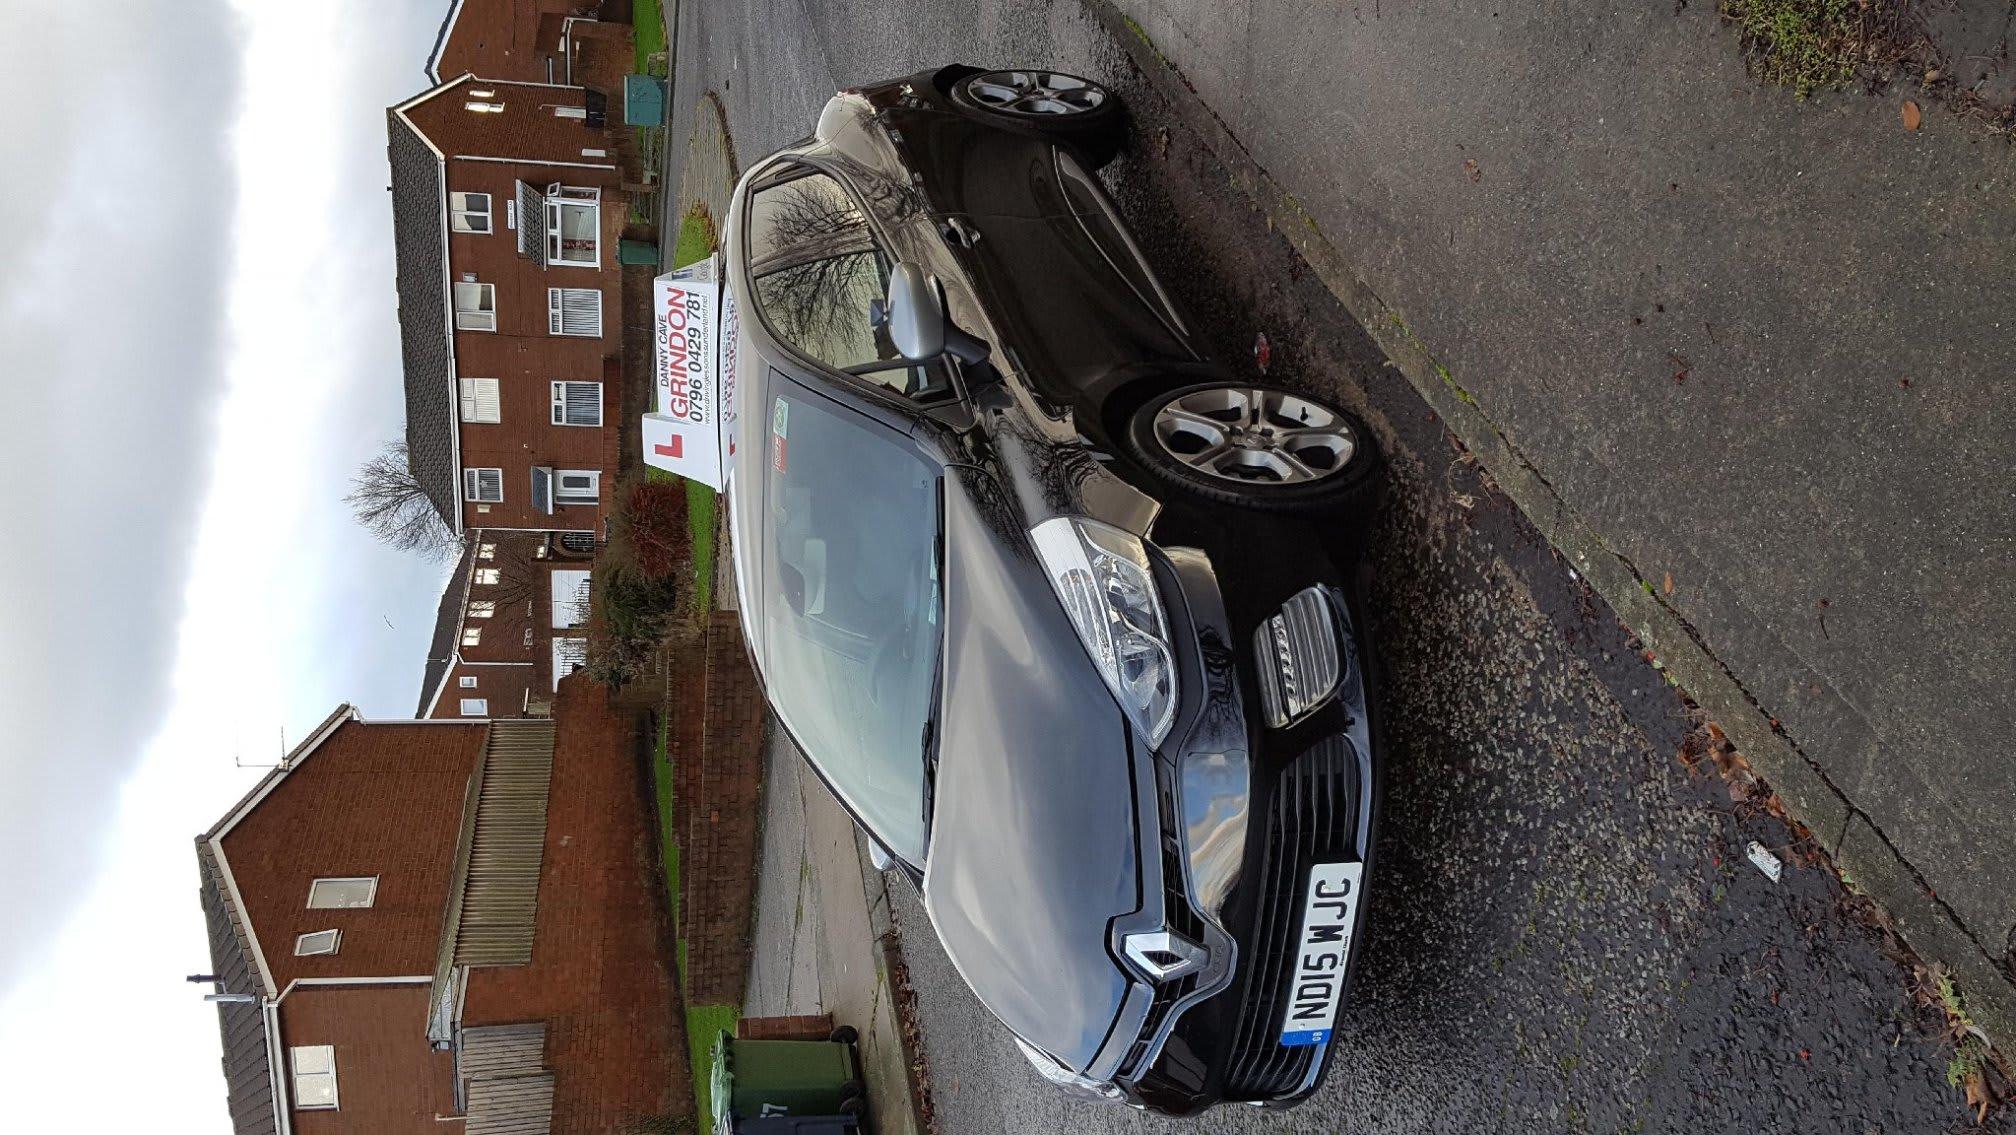 Grindon School Of Motoring Danny Cave | 50 Goodwood Rd, Sunderland SR4 9QA | +44 7960 429781